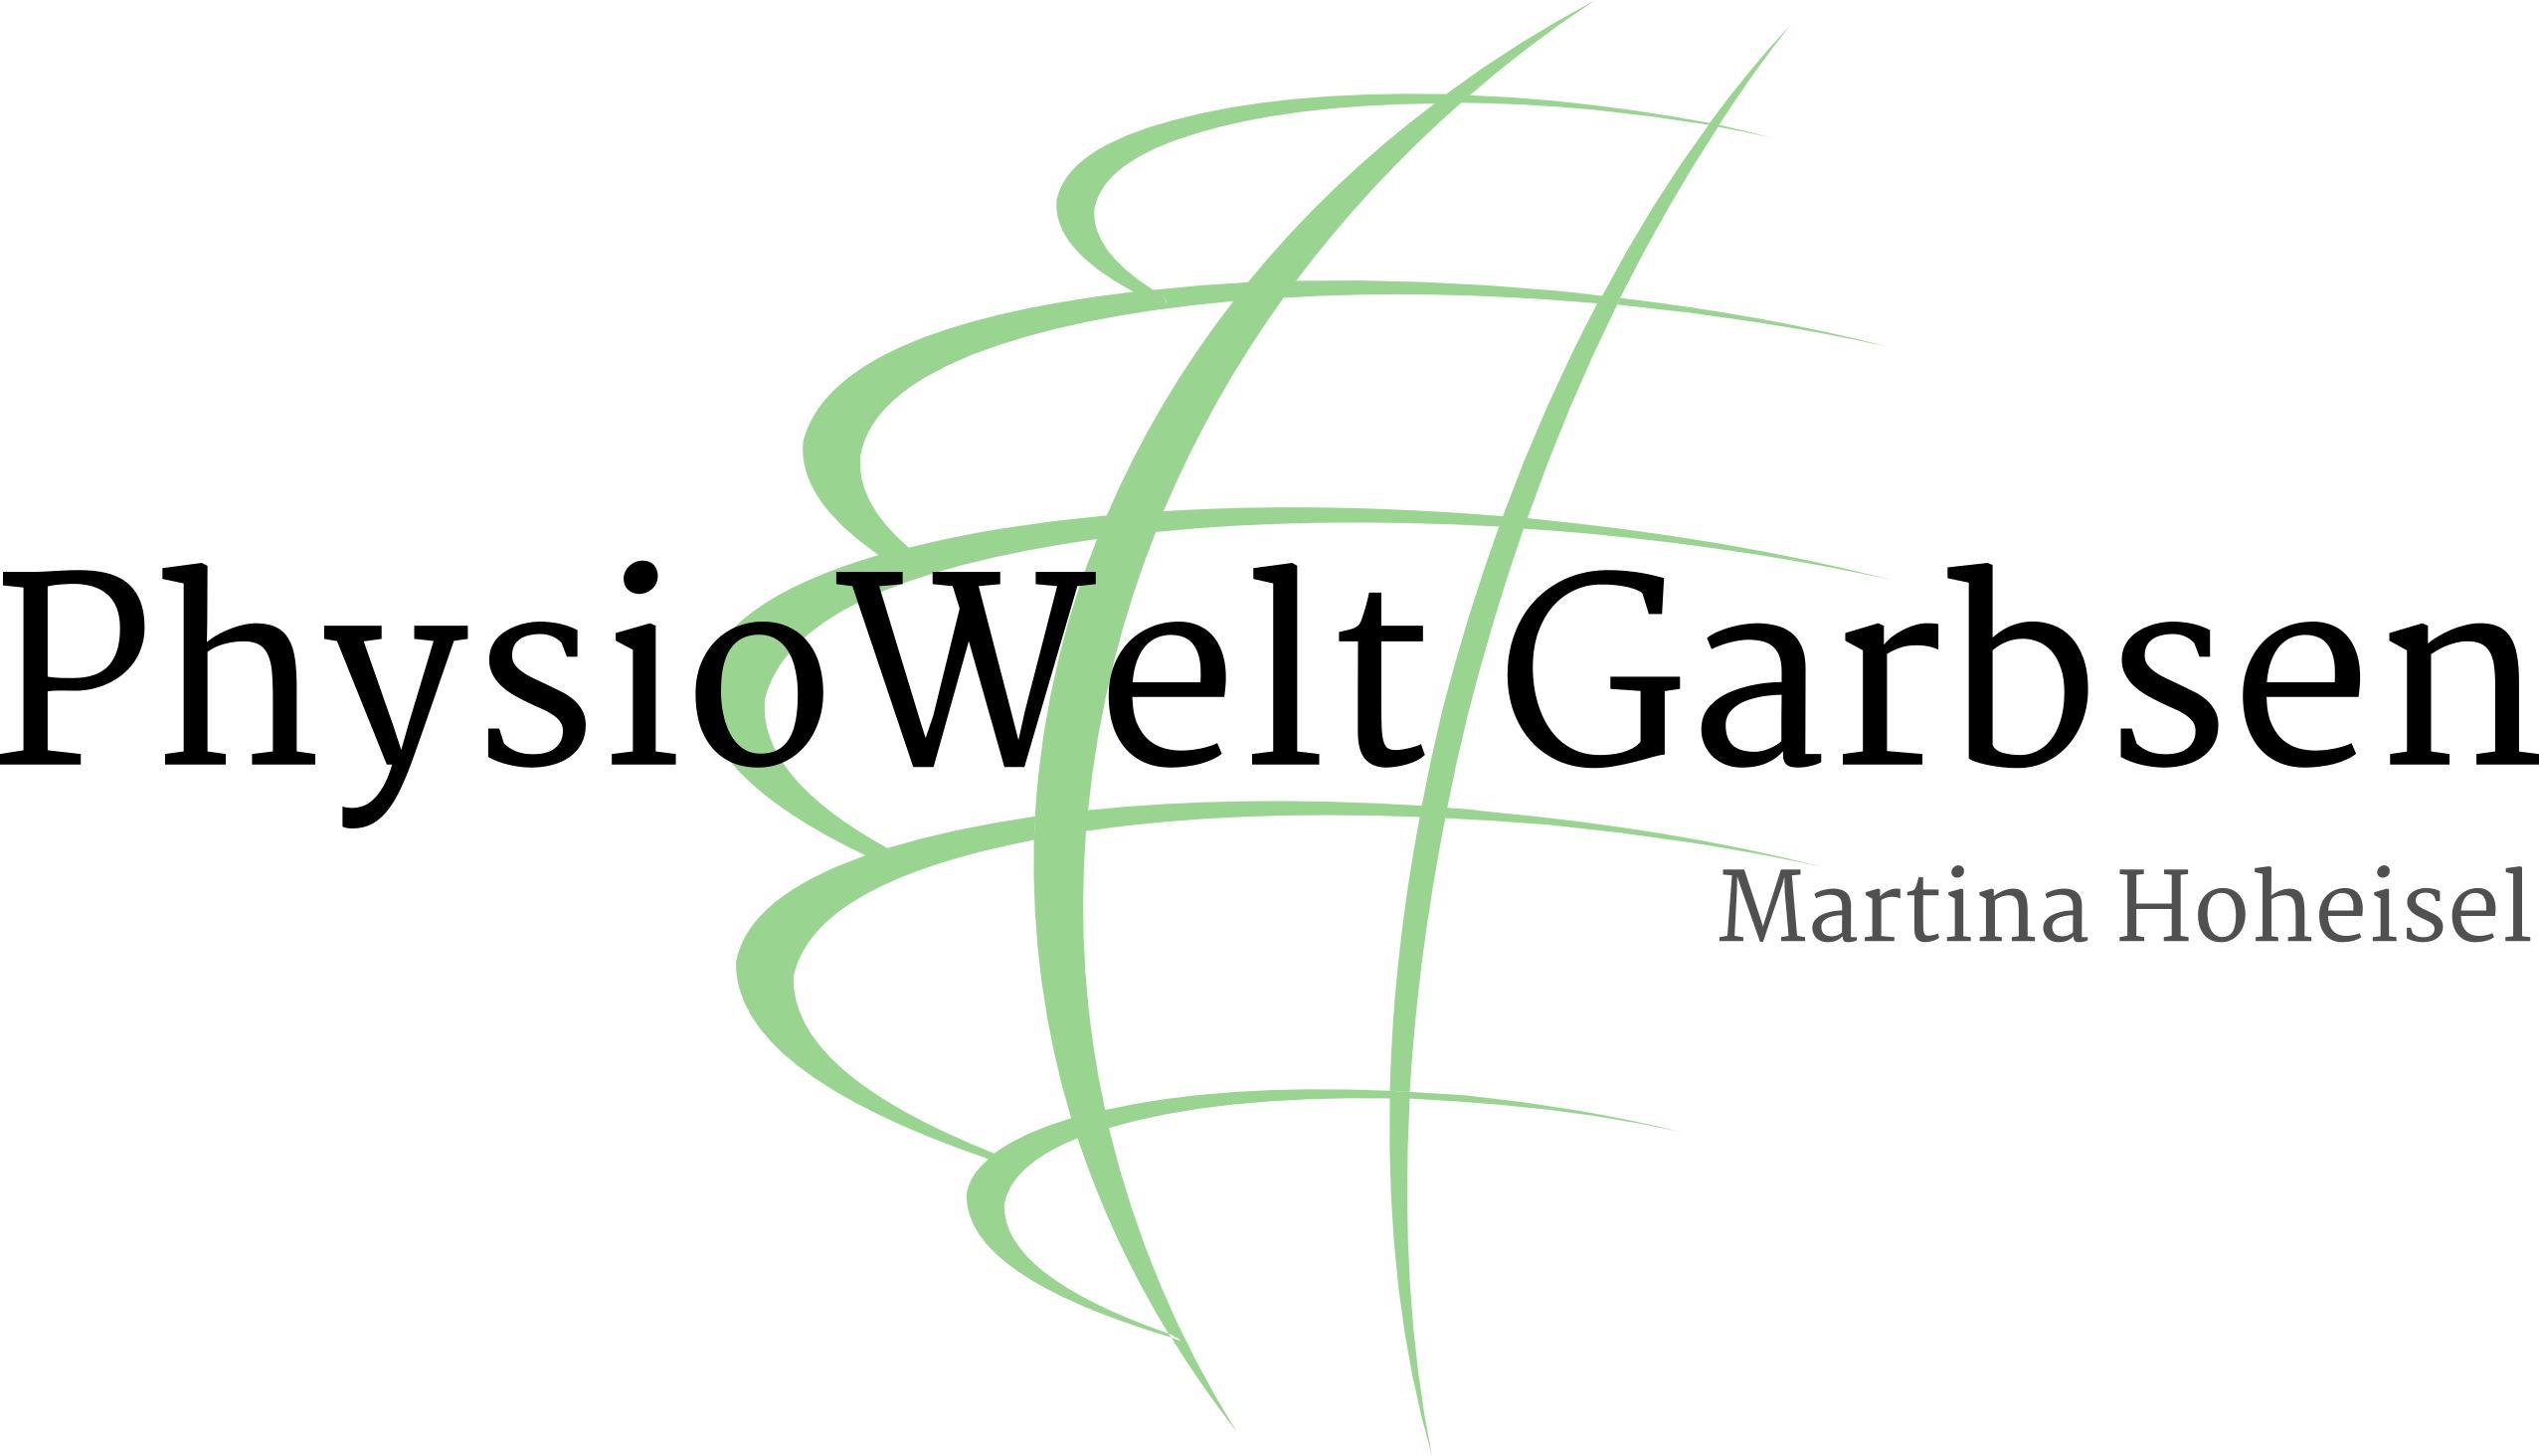 PhysioWelt Garbsen